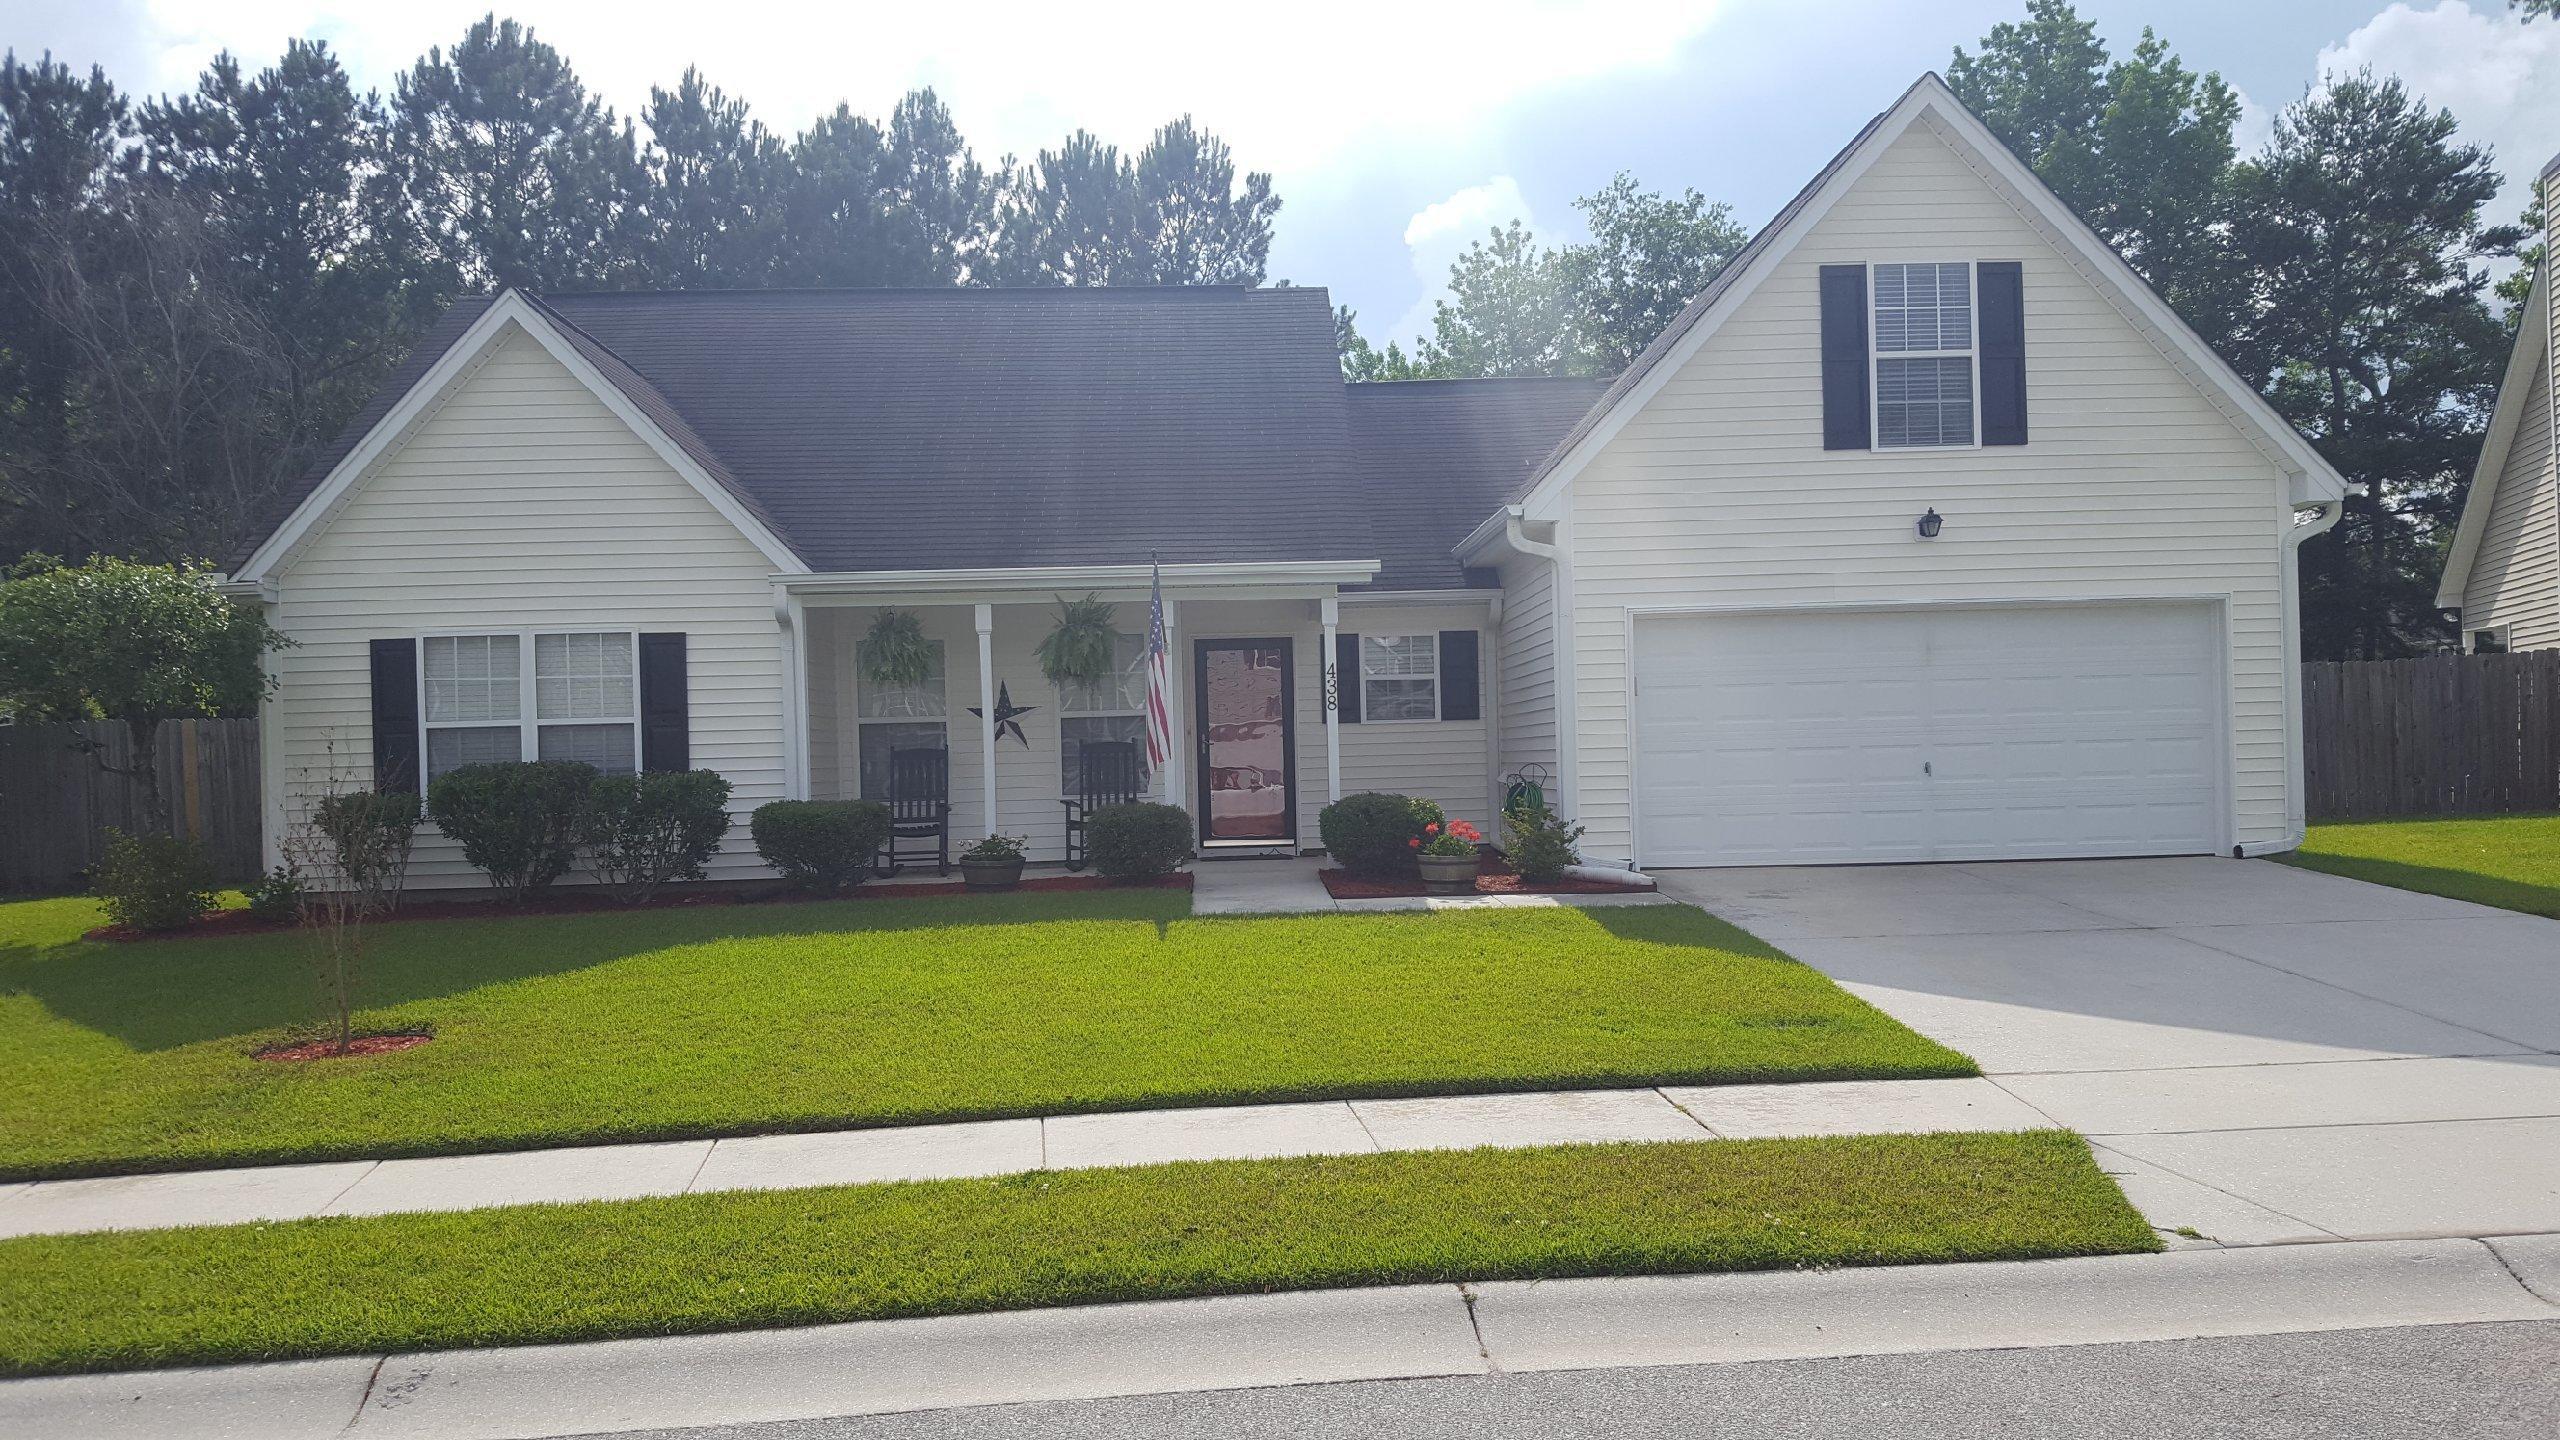 Heatherwoods Homes For Sale - 438 Equinox, Ladson, SC - 0